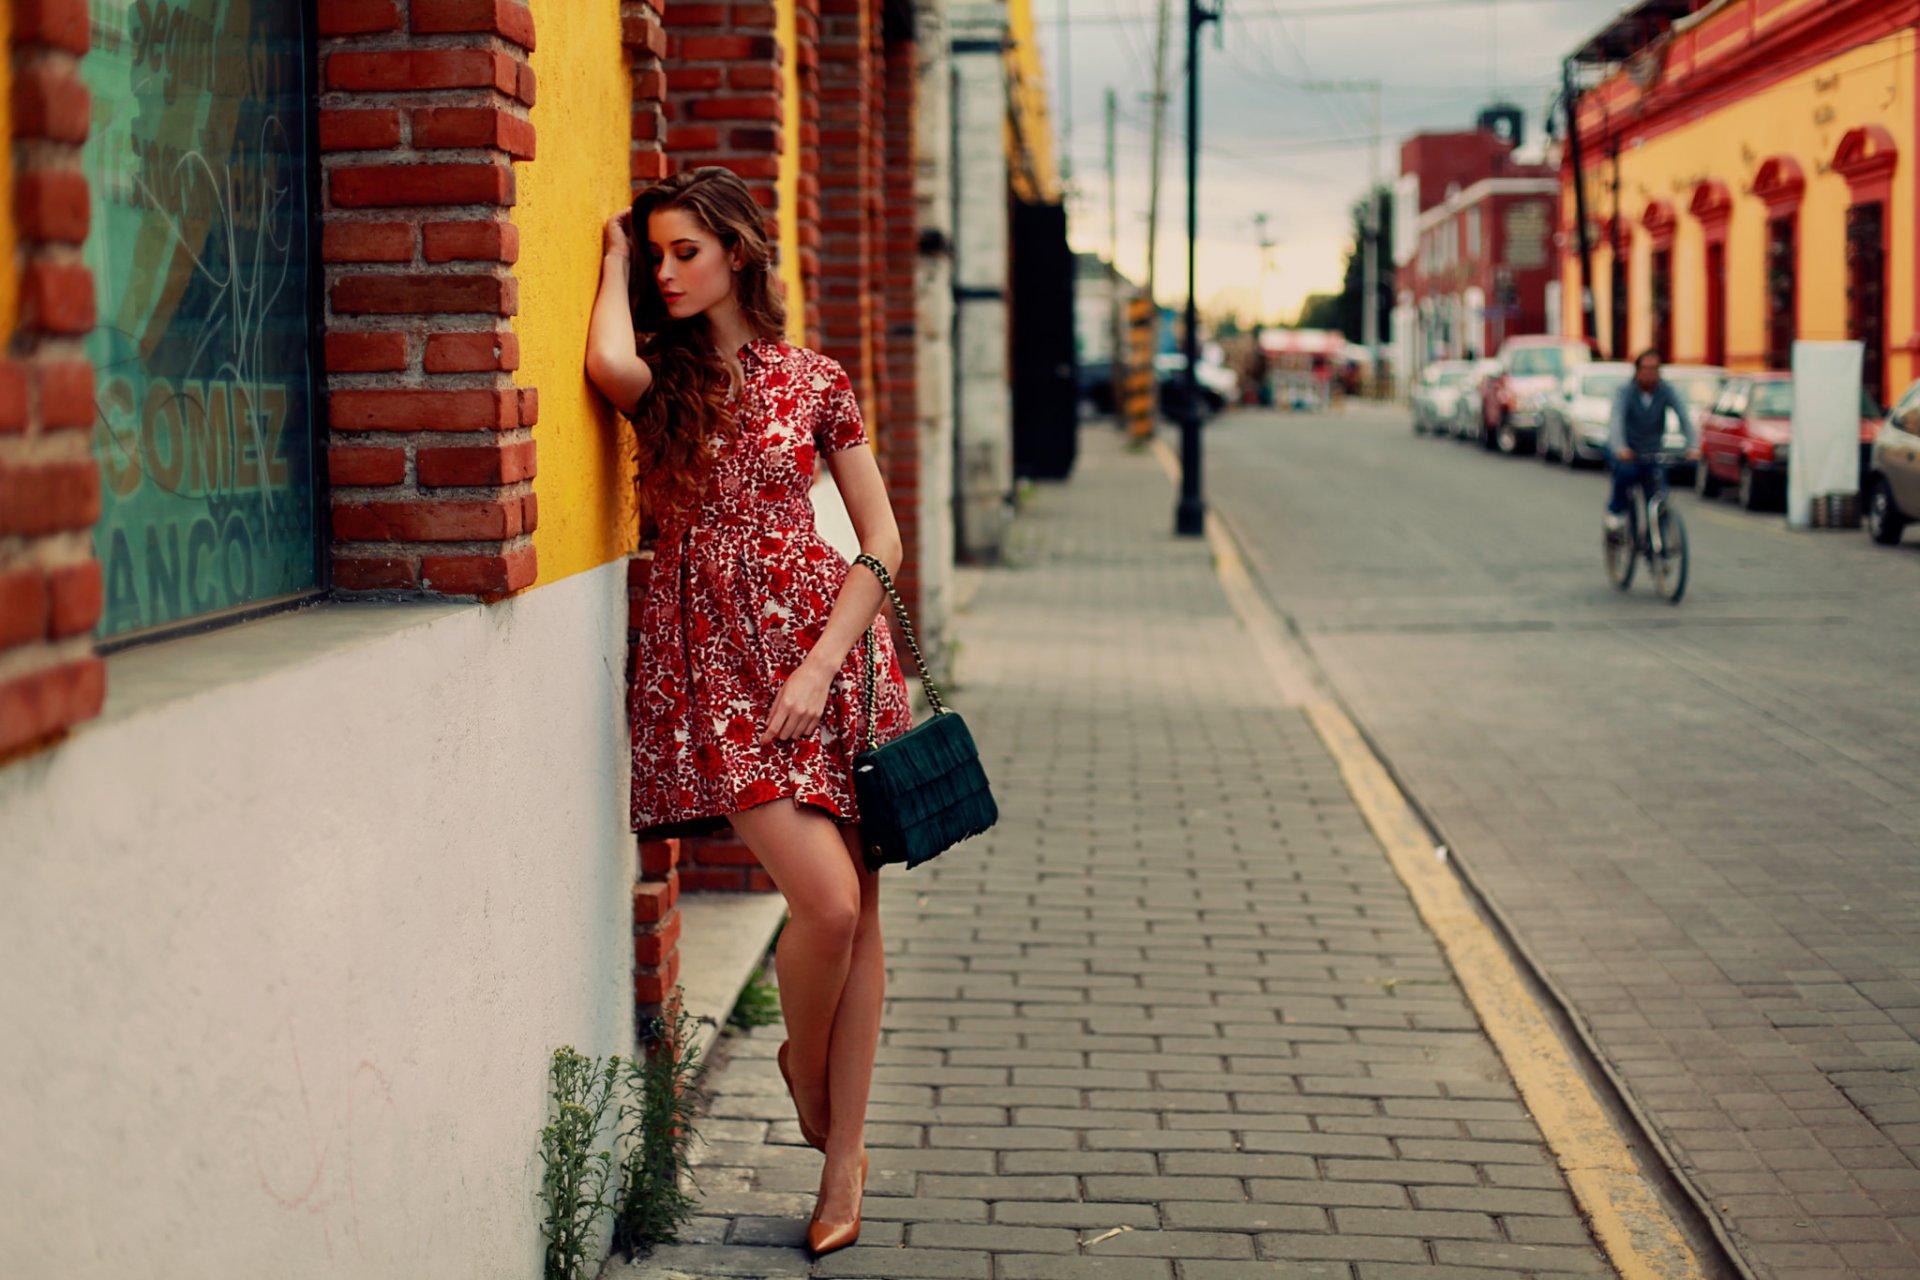 Фото девушки в платьях на улице